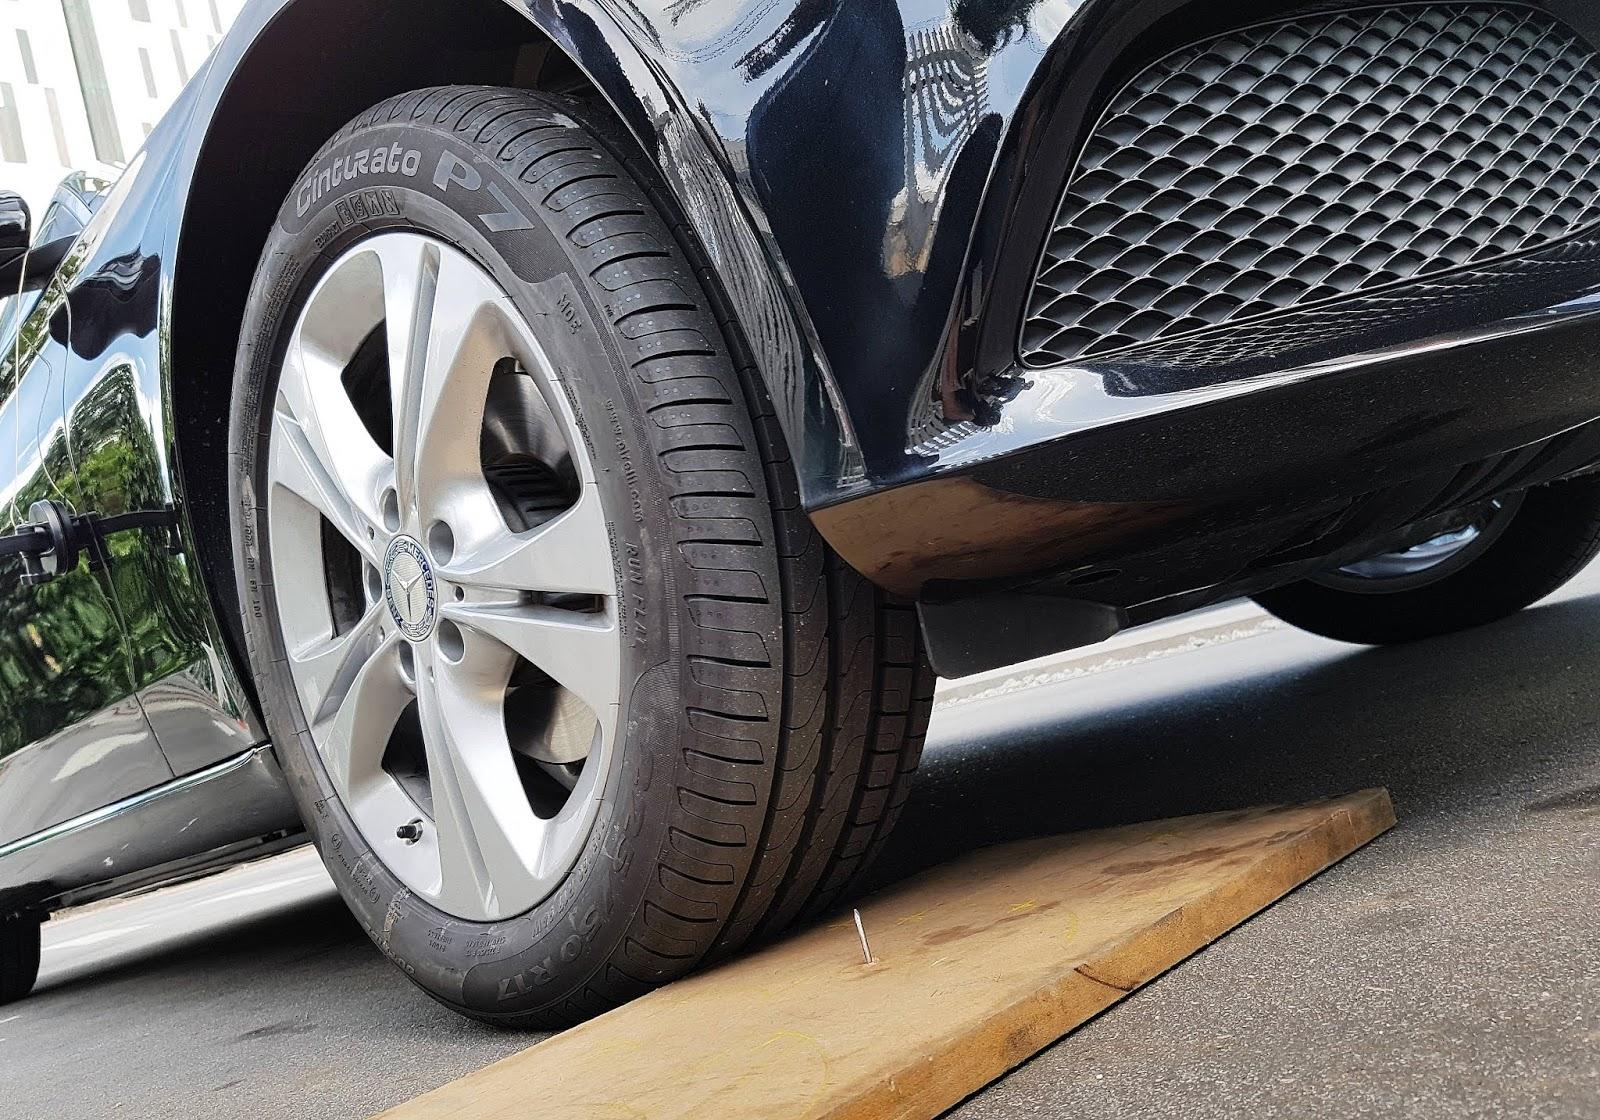 pneus-run-flat-o que é-mercedes-benz-bmw-porsche-ferrari-toyota-ford-volkswagen-hyundai